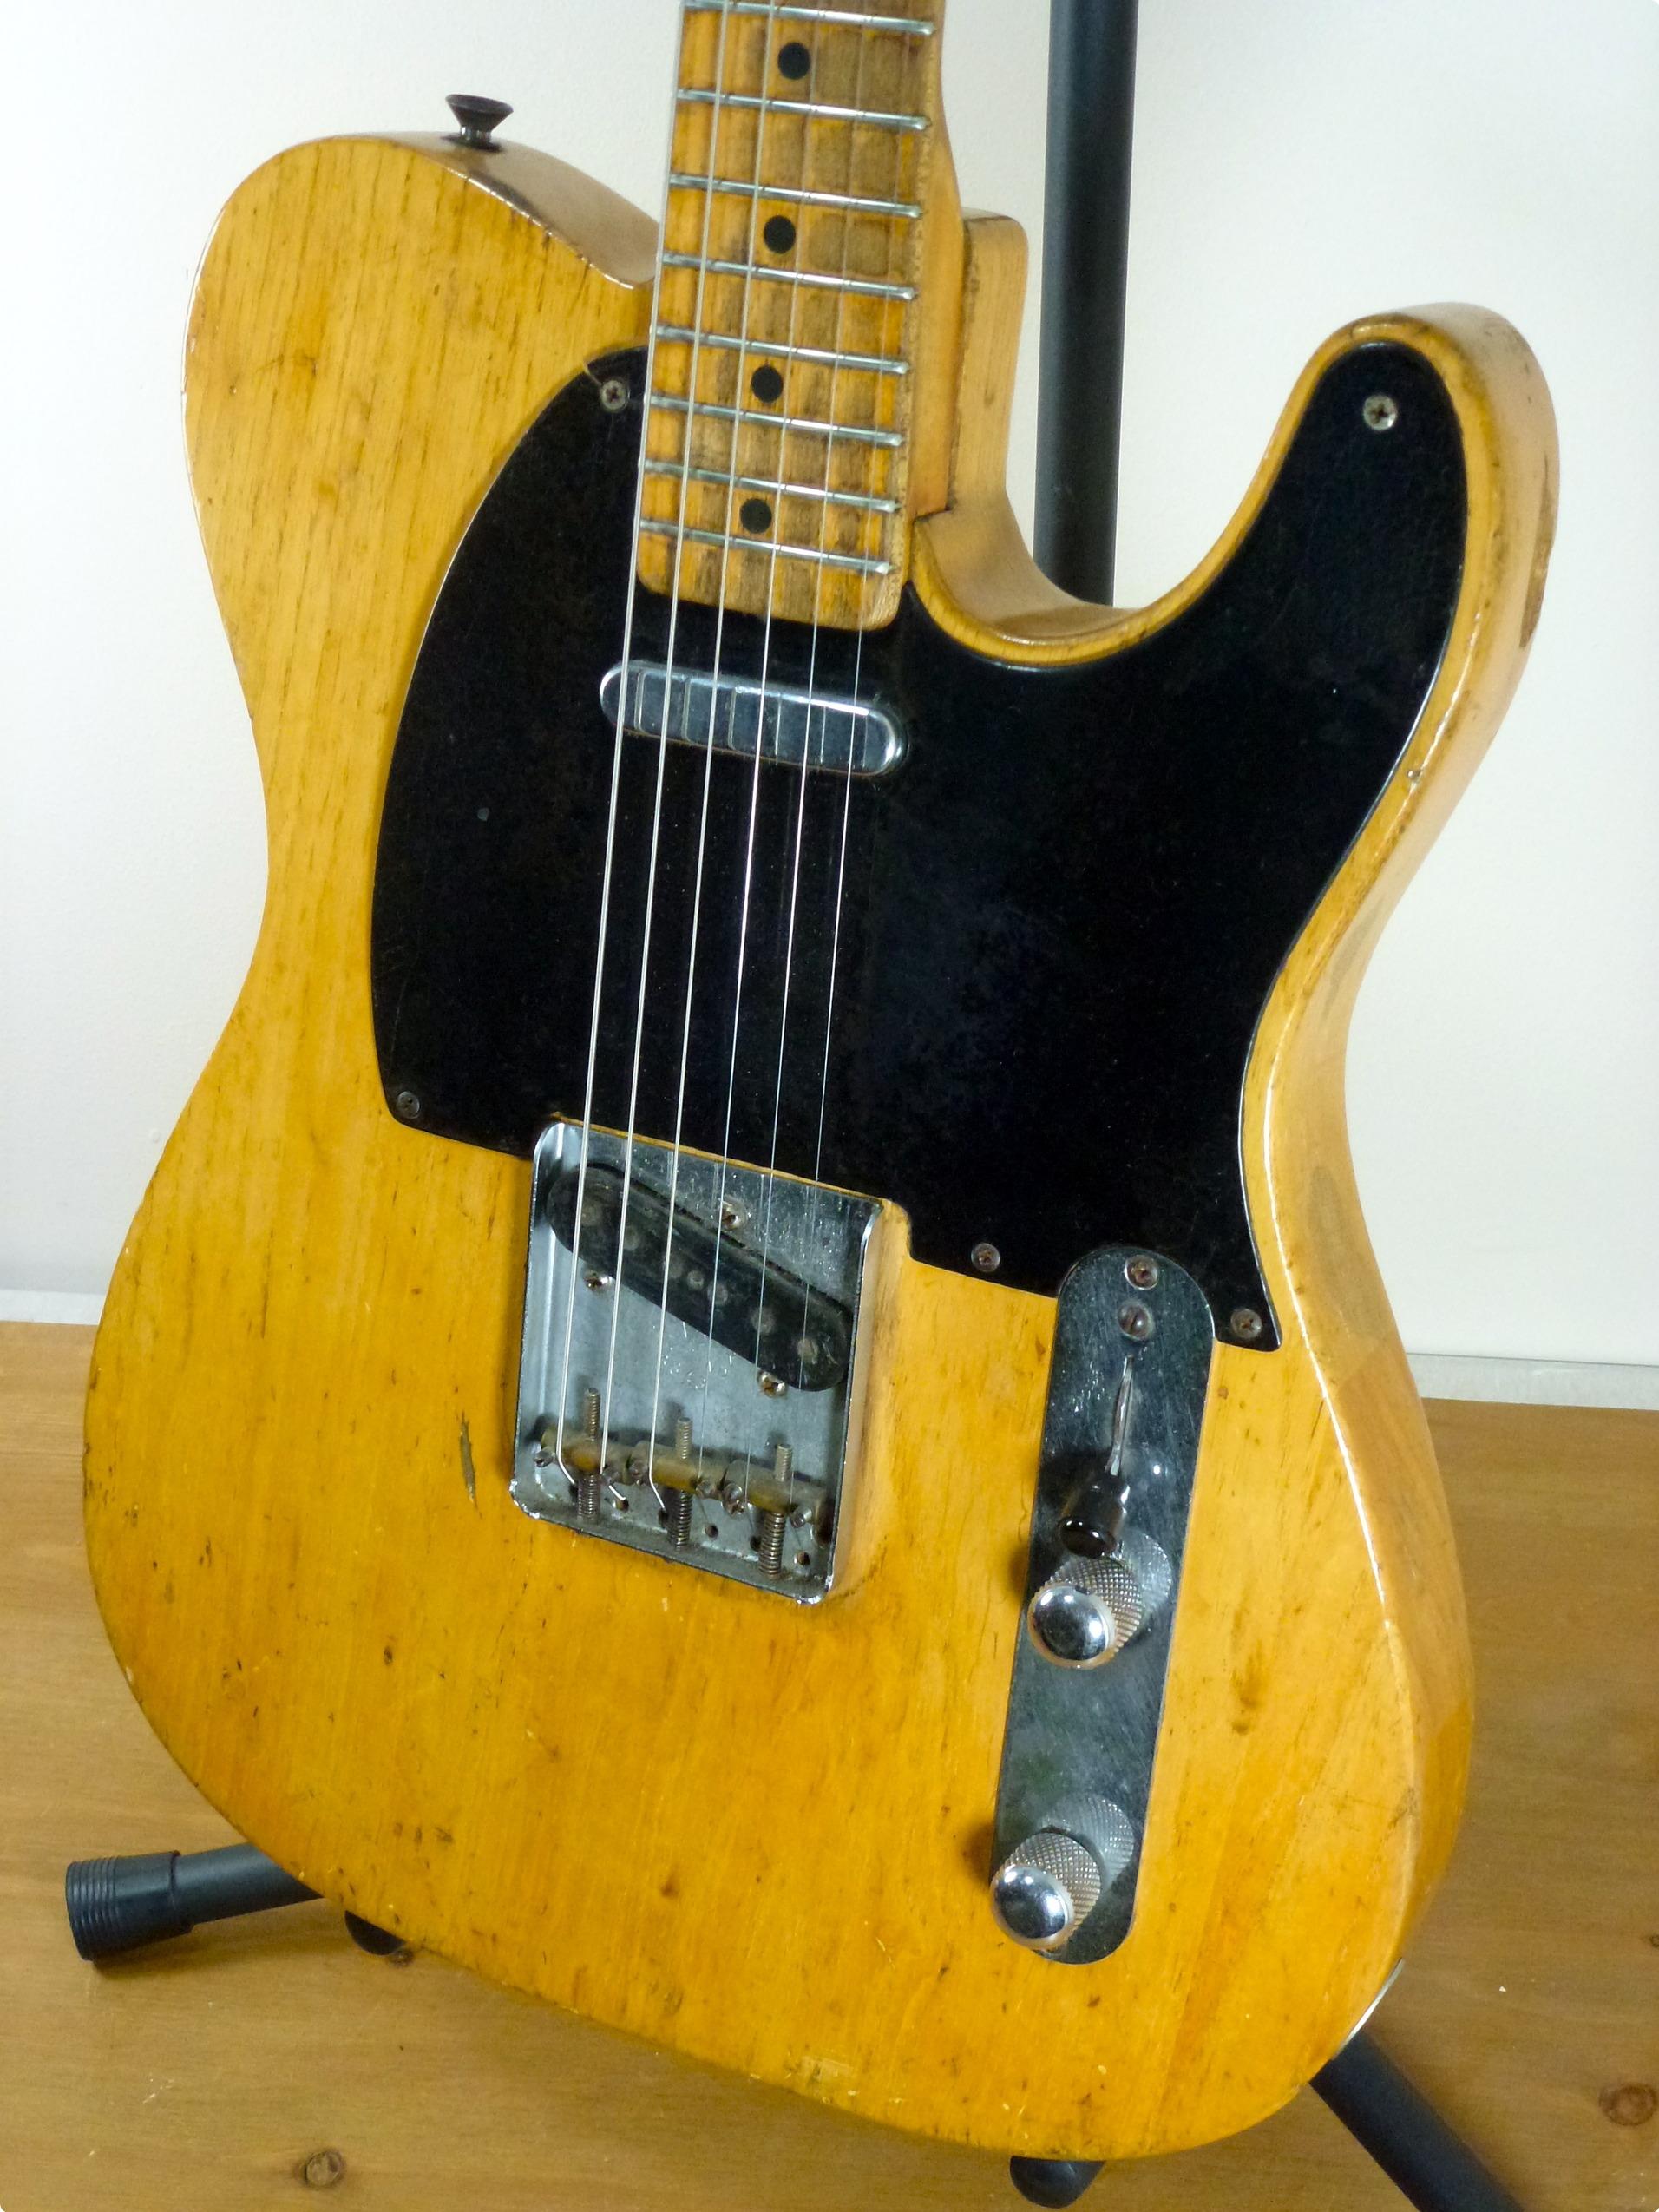 Fender telecaster 1953 natural guitar for sale rock stars for Rock star photos for sale